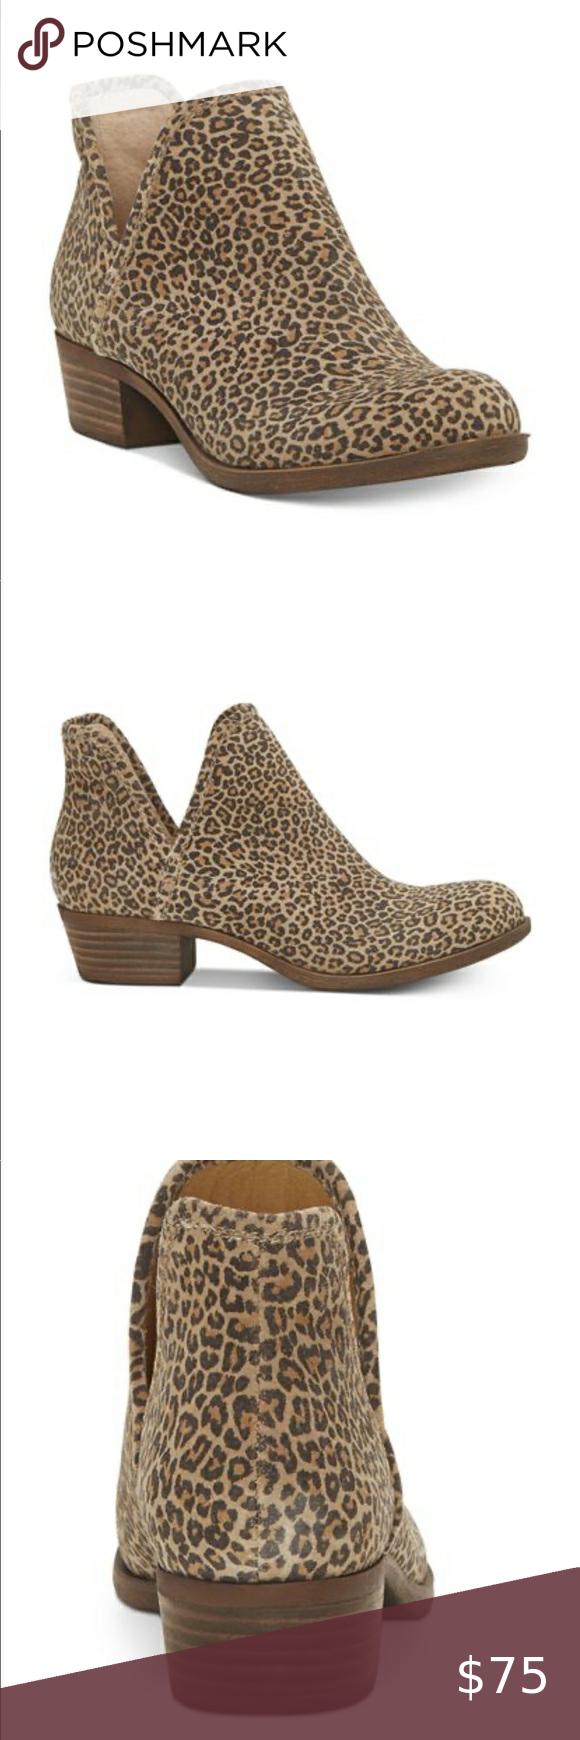 lucky baley bootie leopard